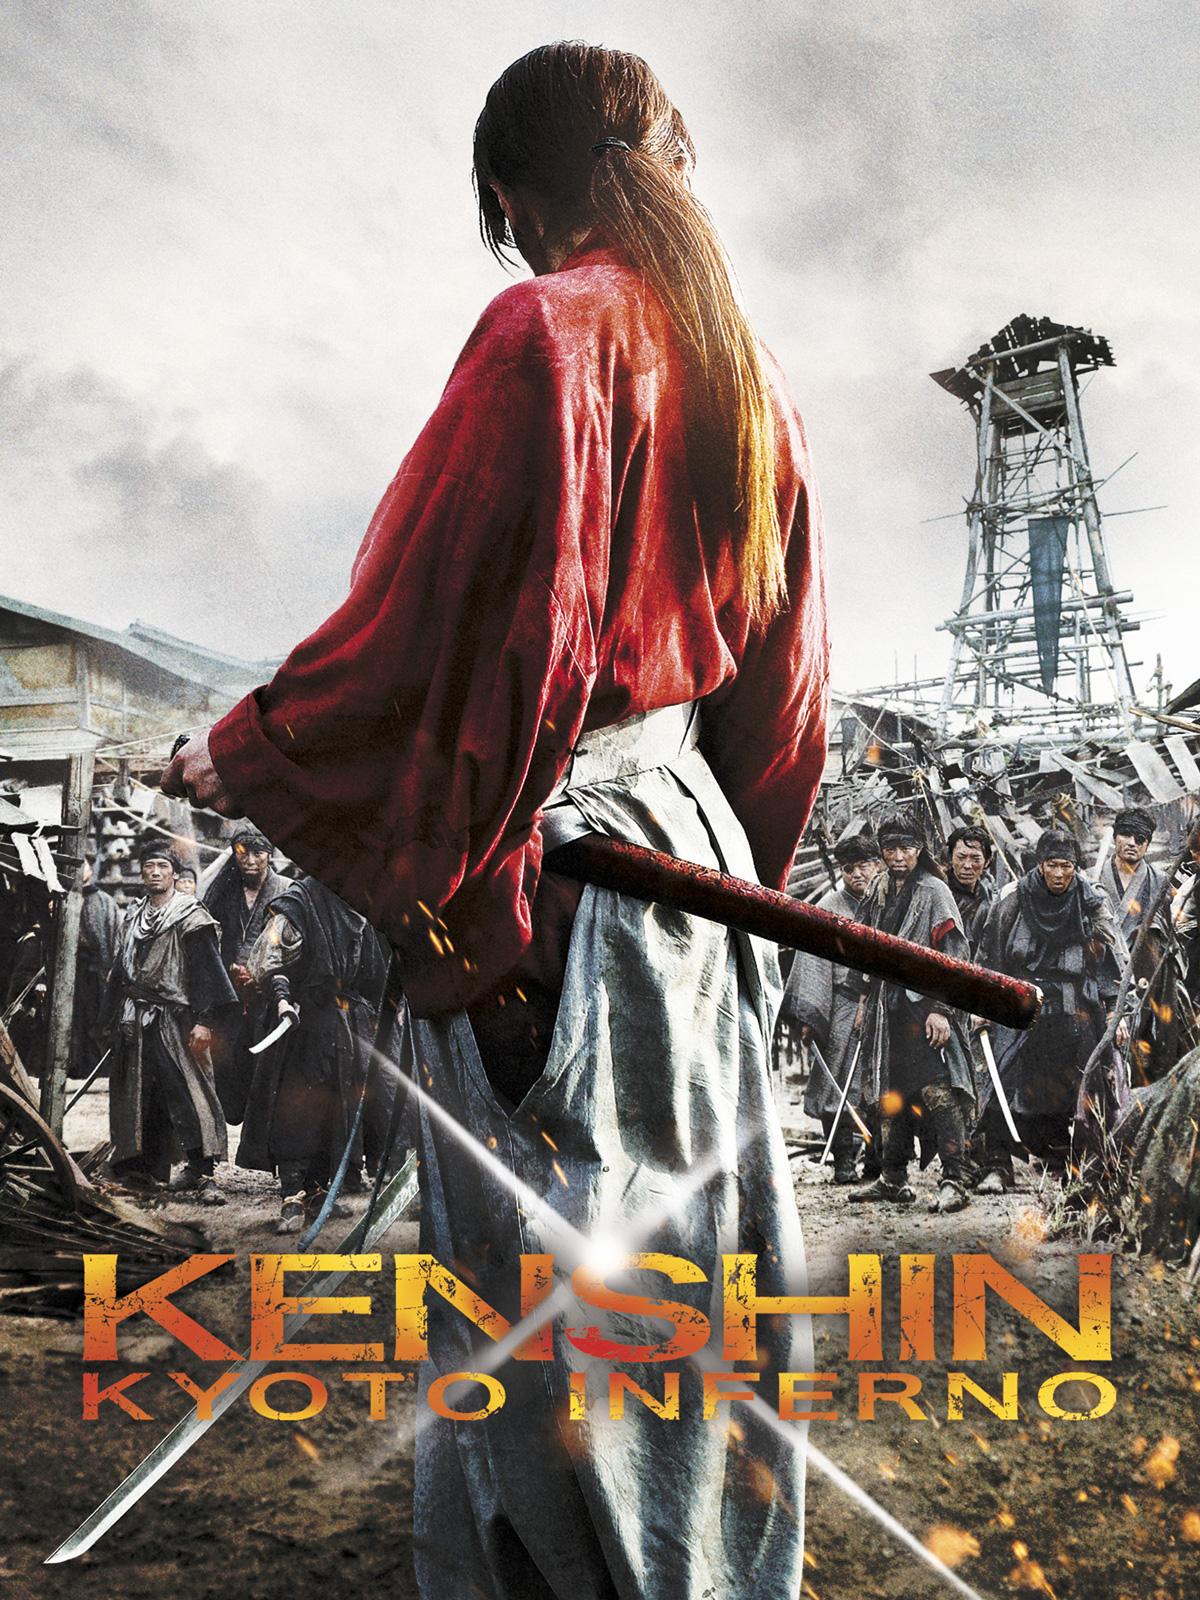 Kenshin Kyoto Inferno ddl